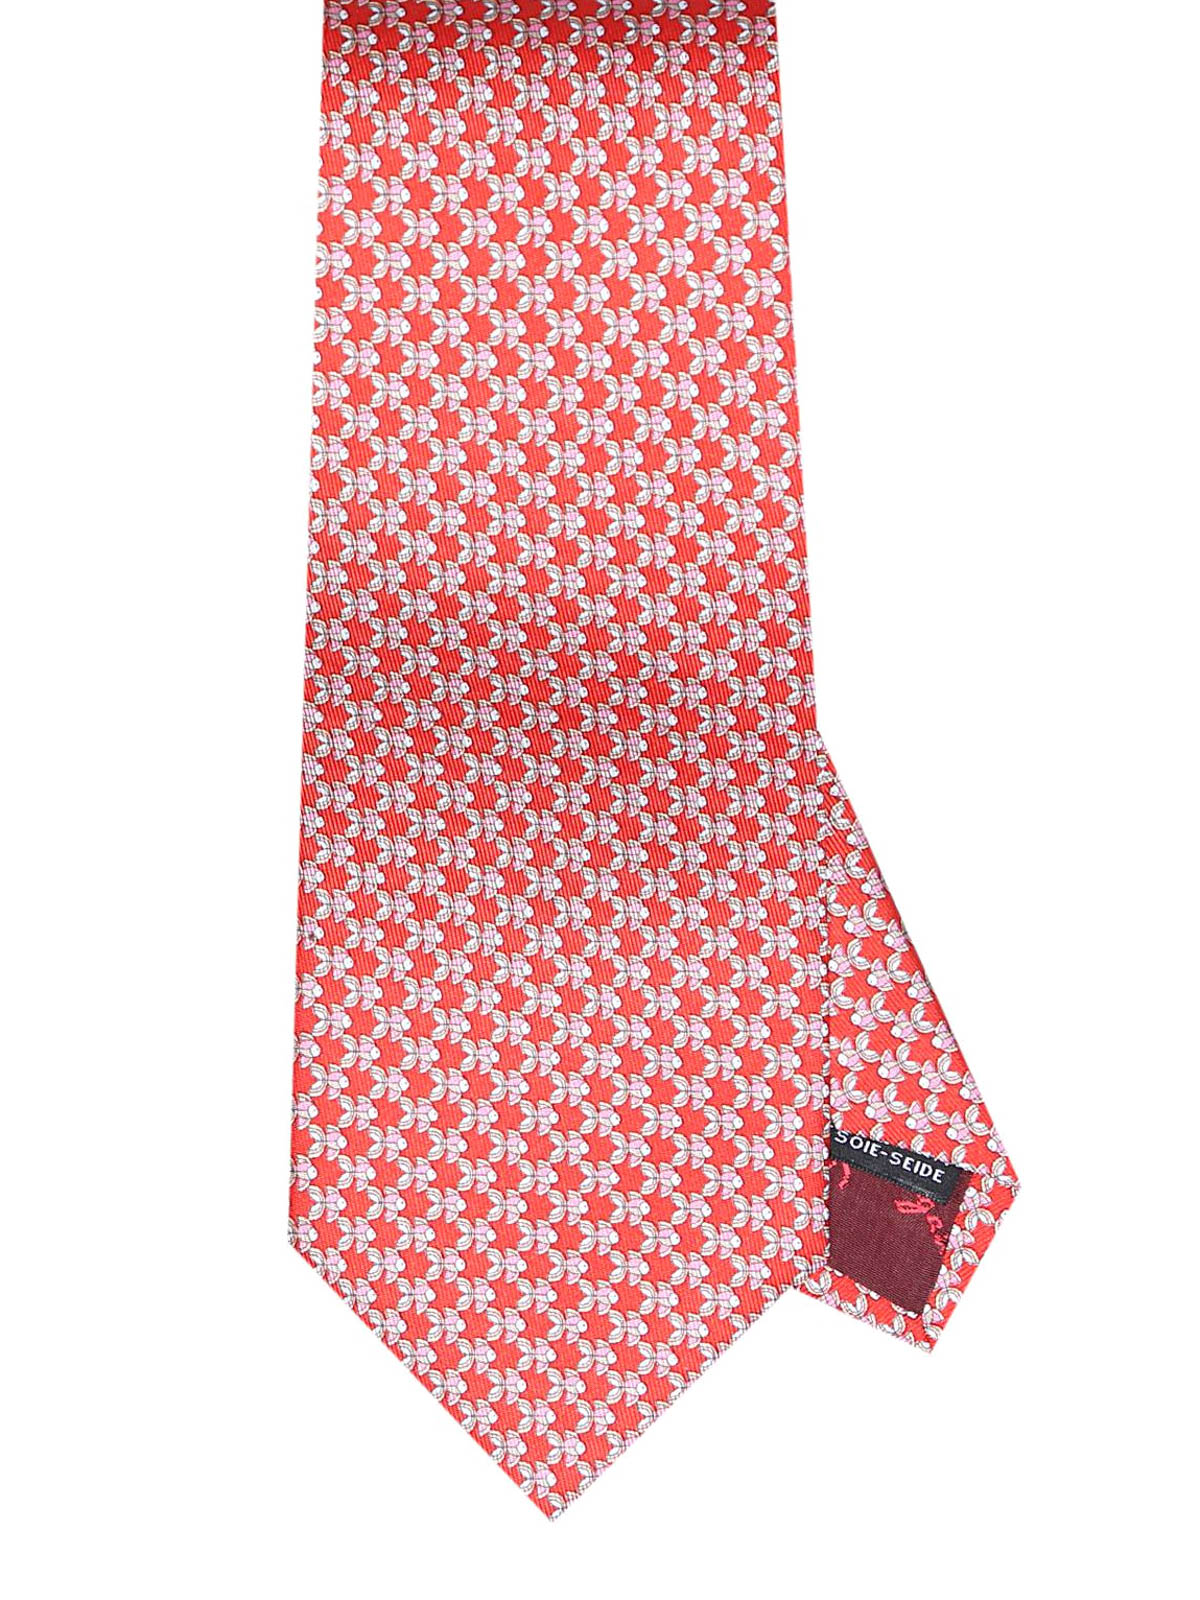 design senza tempo 103c0 1c7ca Salvatore Ferragamo - Cravatta in seta con pesciolini ...